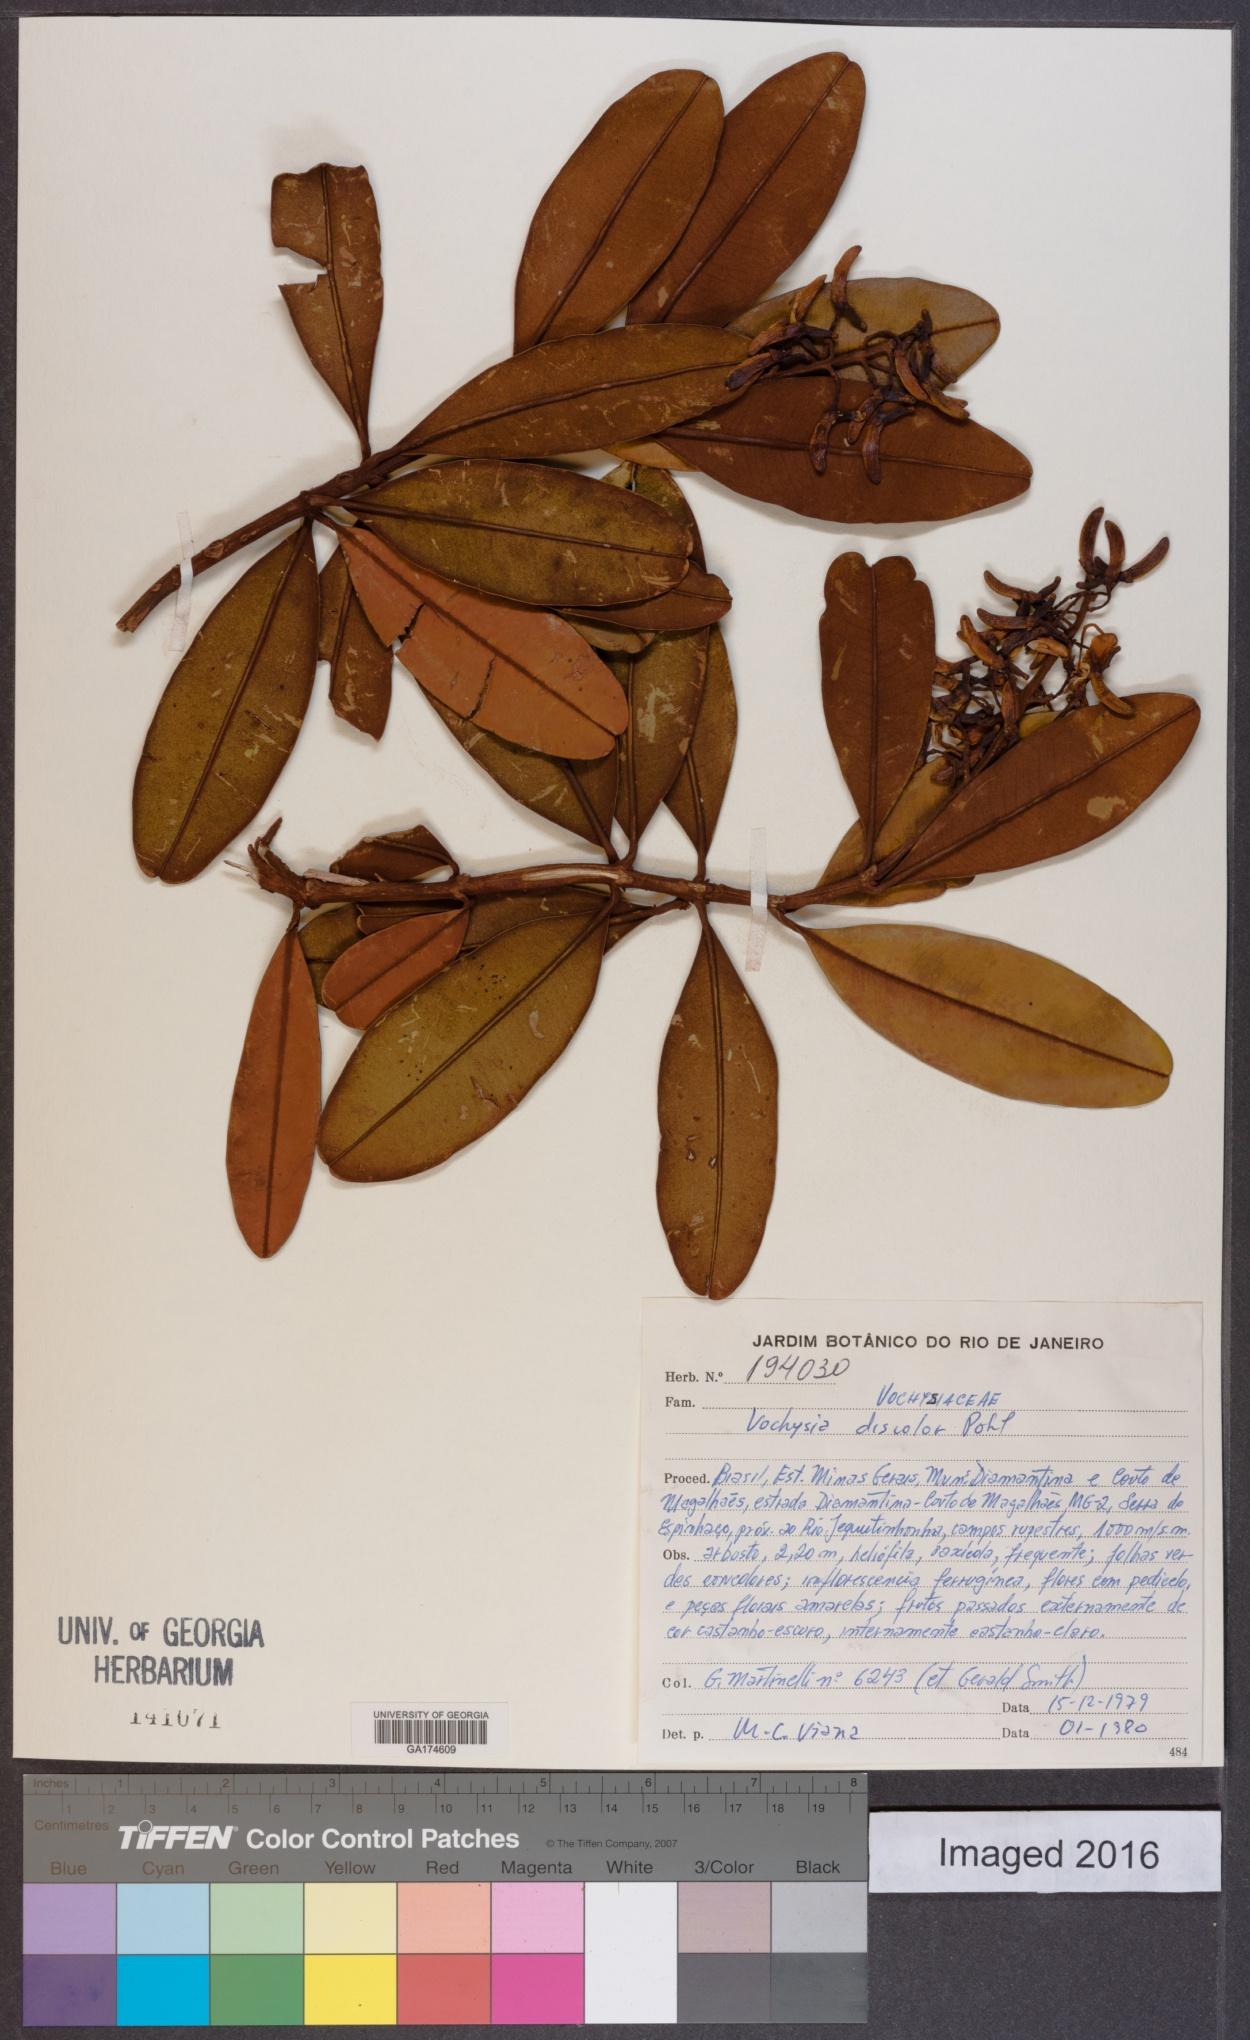 Vochysia discolor image